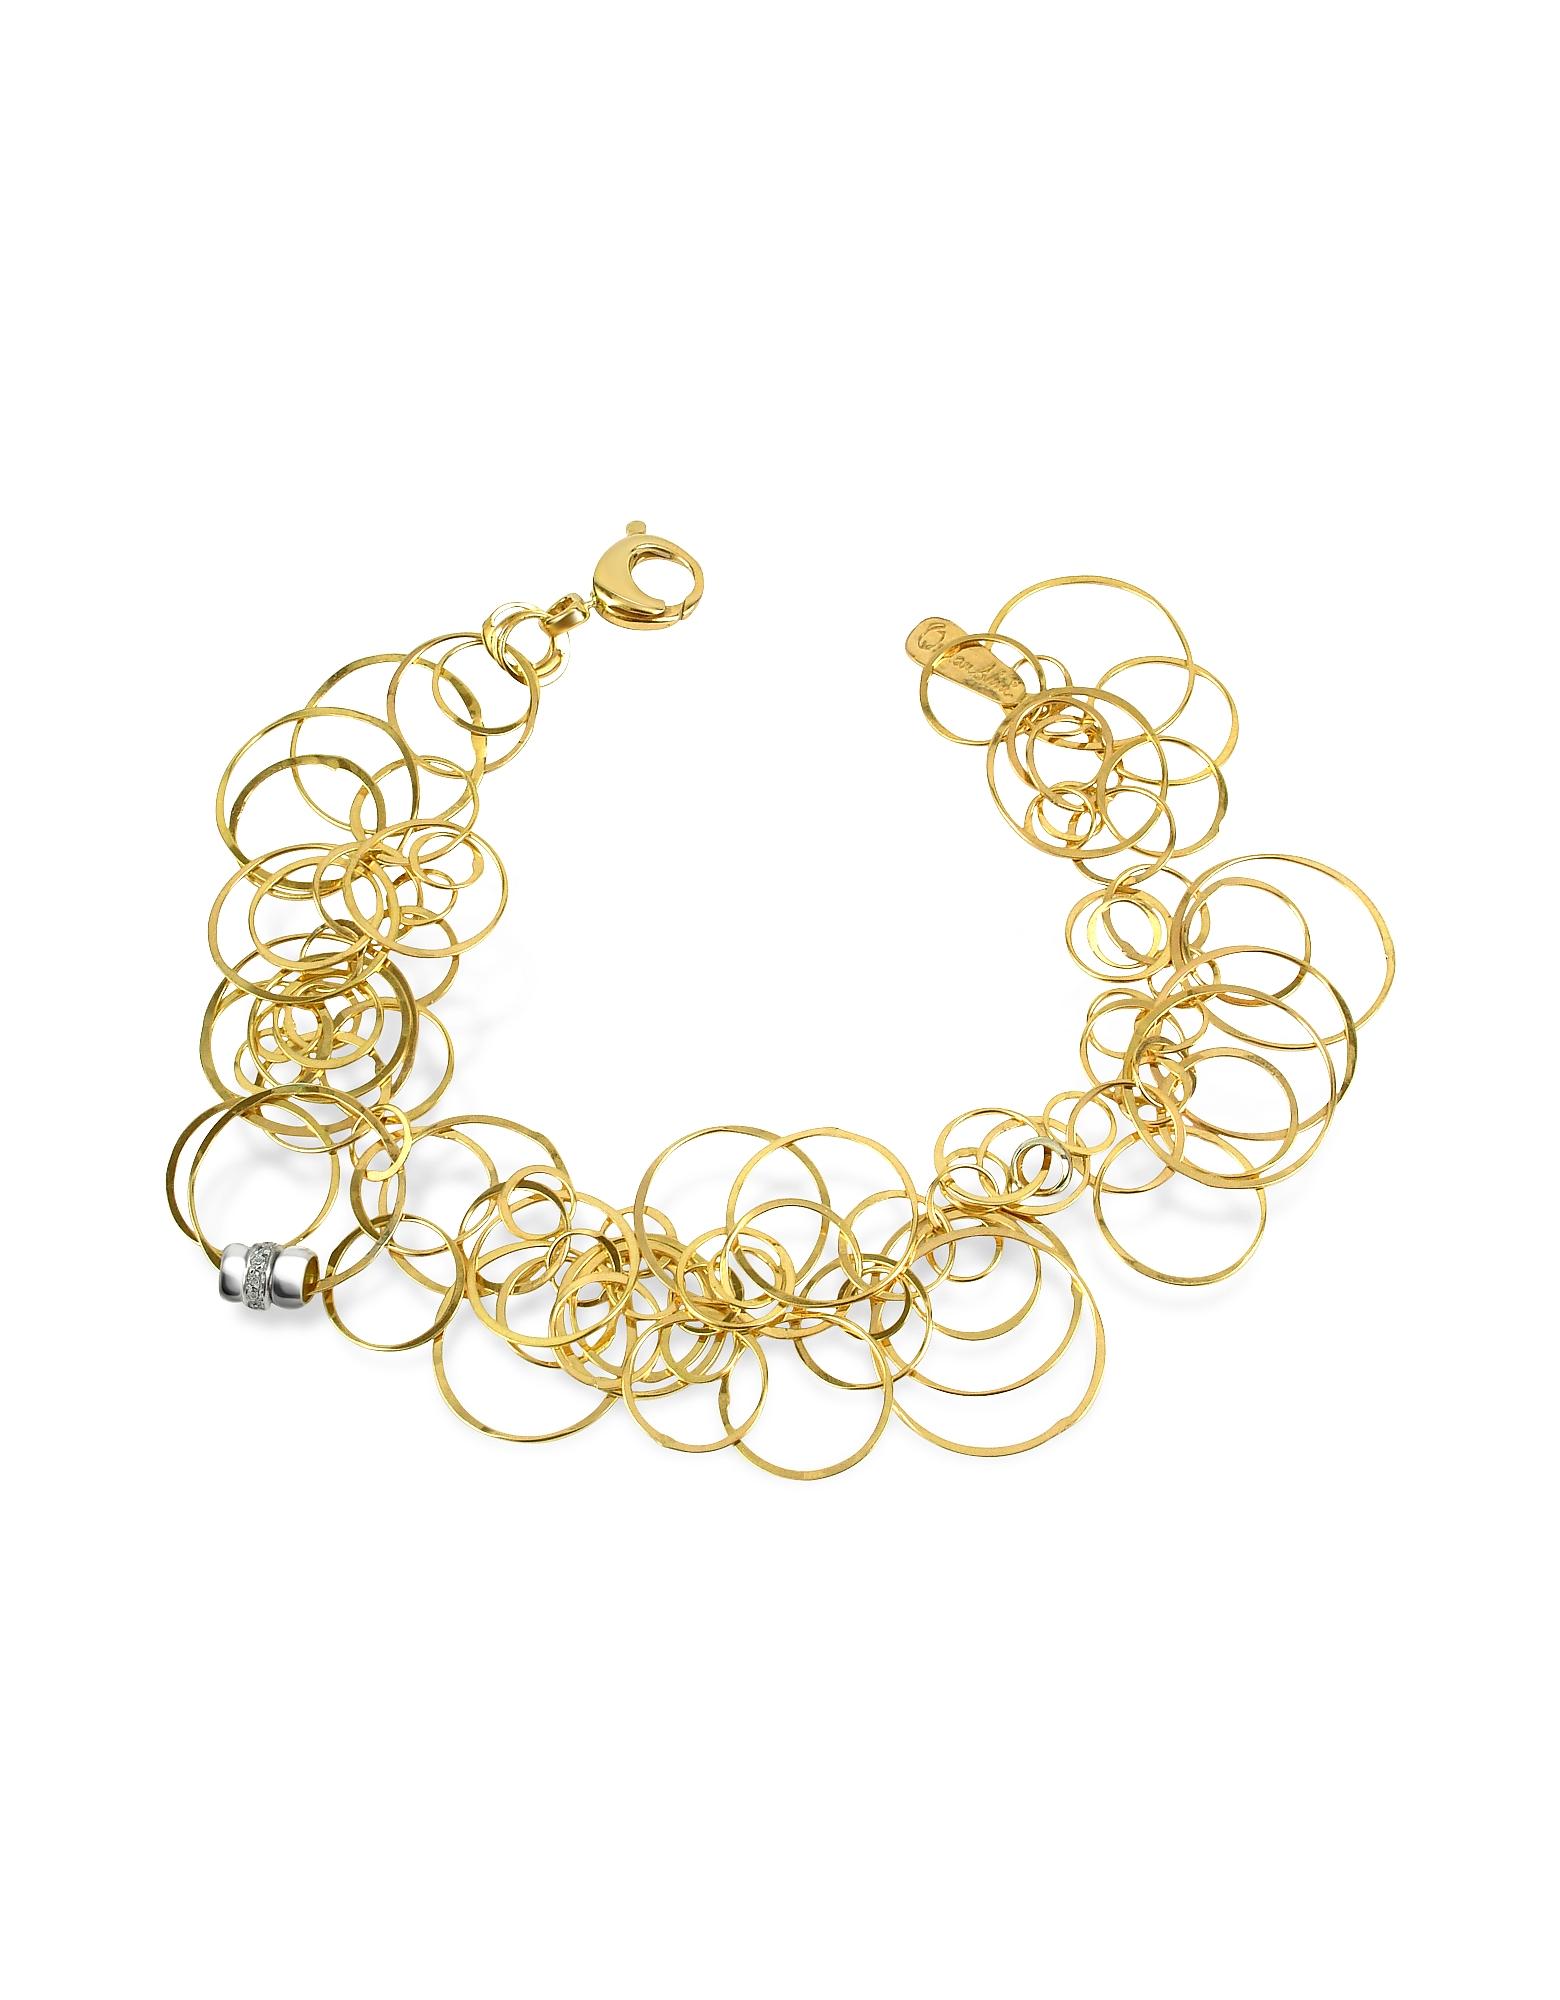 Orlando Orlandini Bracelets, Scintille - Diamond 18K Yellow Gold Bracelet